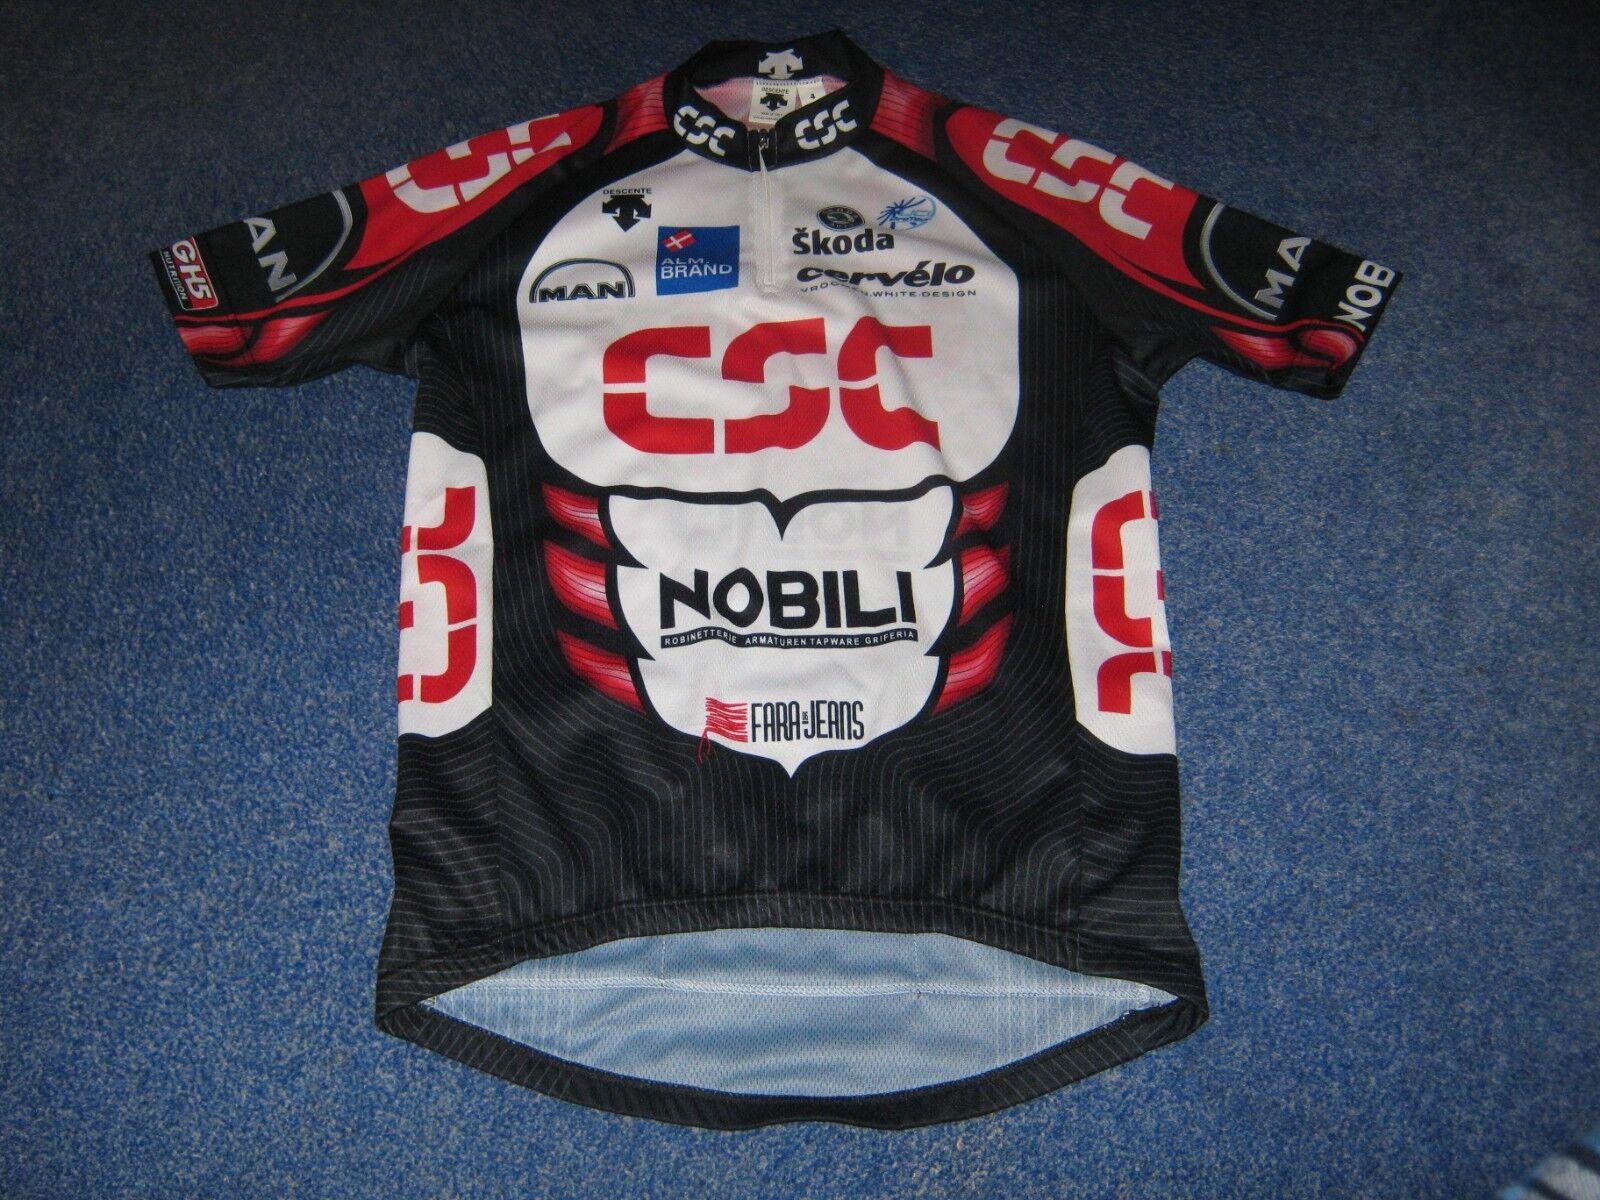 CSC Nobili Cervelo Riis Cycling Descente Italian cycling jersey [4] BNWOT